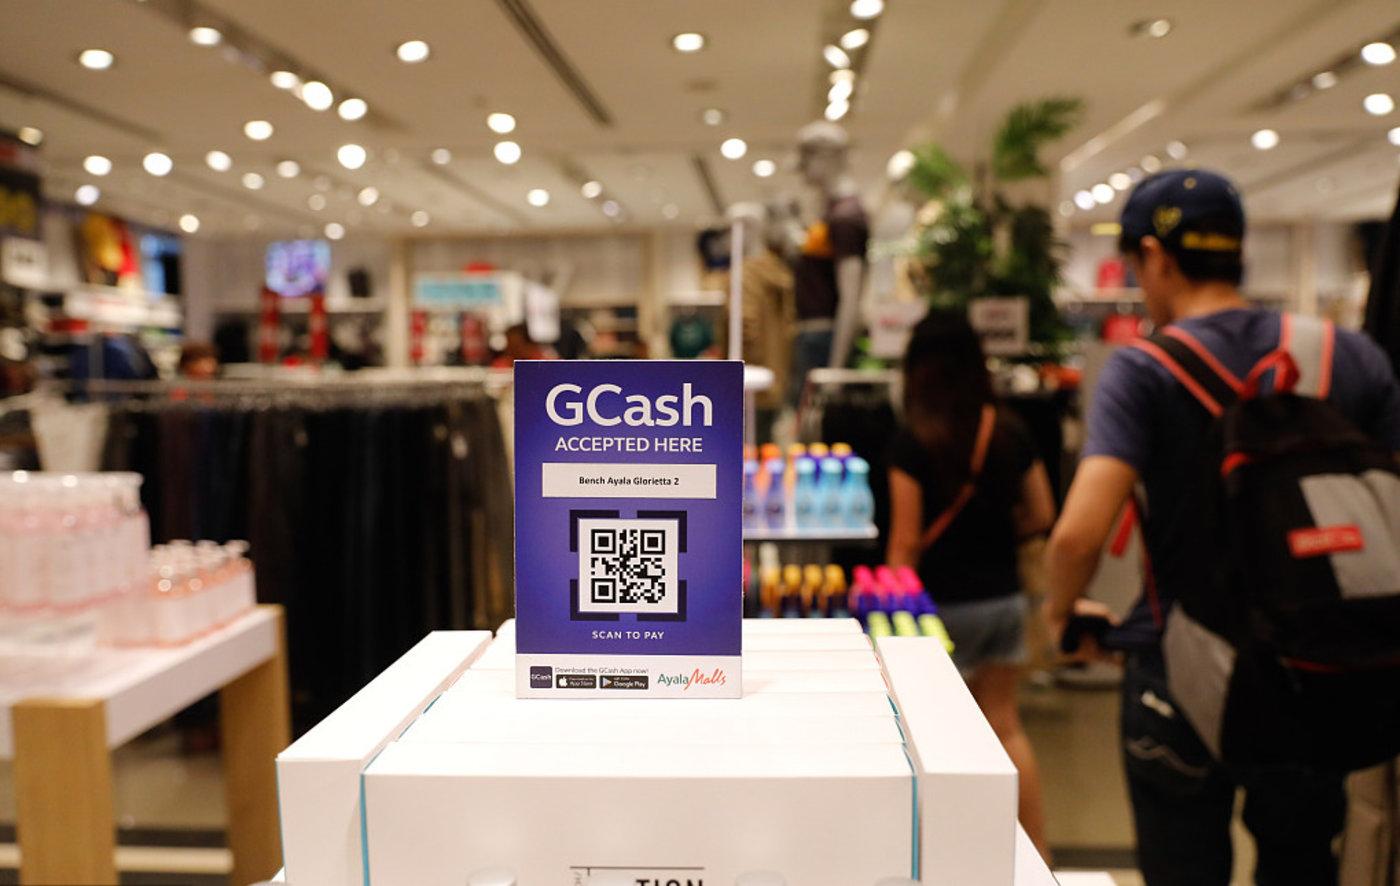 Mynt主要产品是电子钱包GCash 图片来源/视觉中国